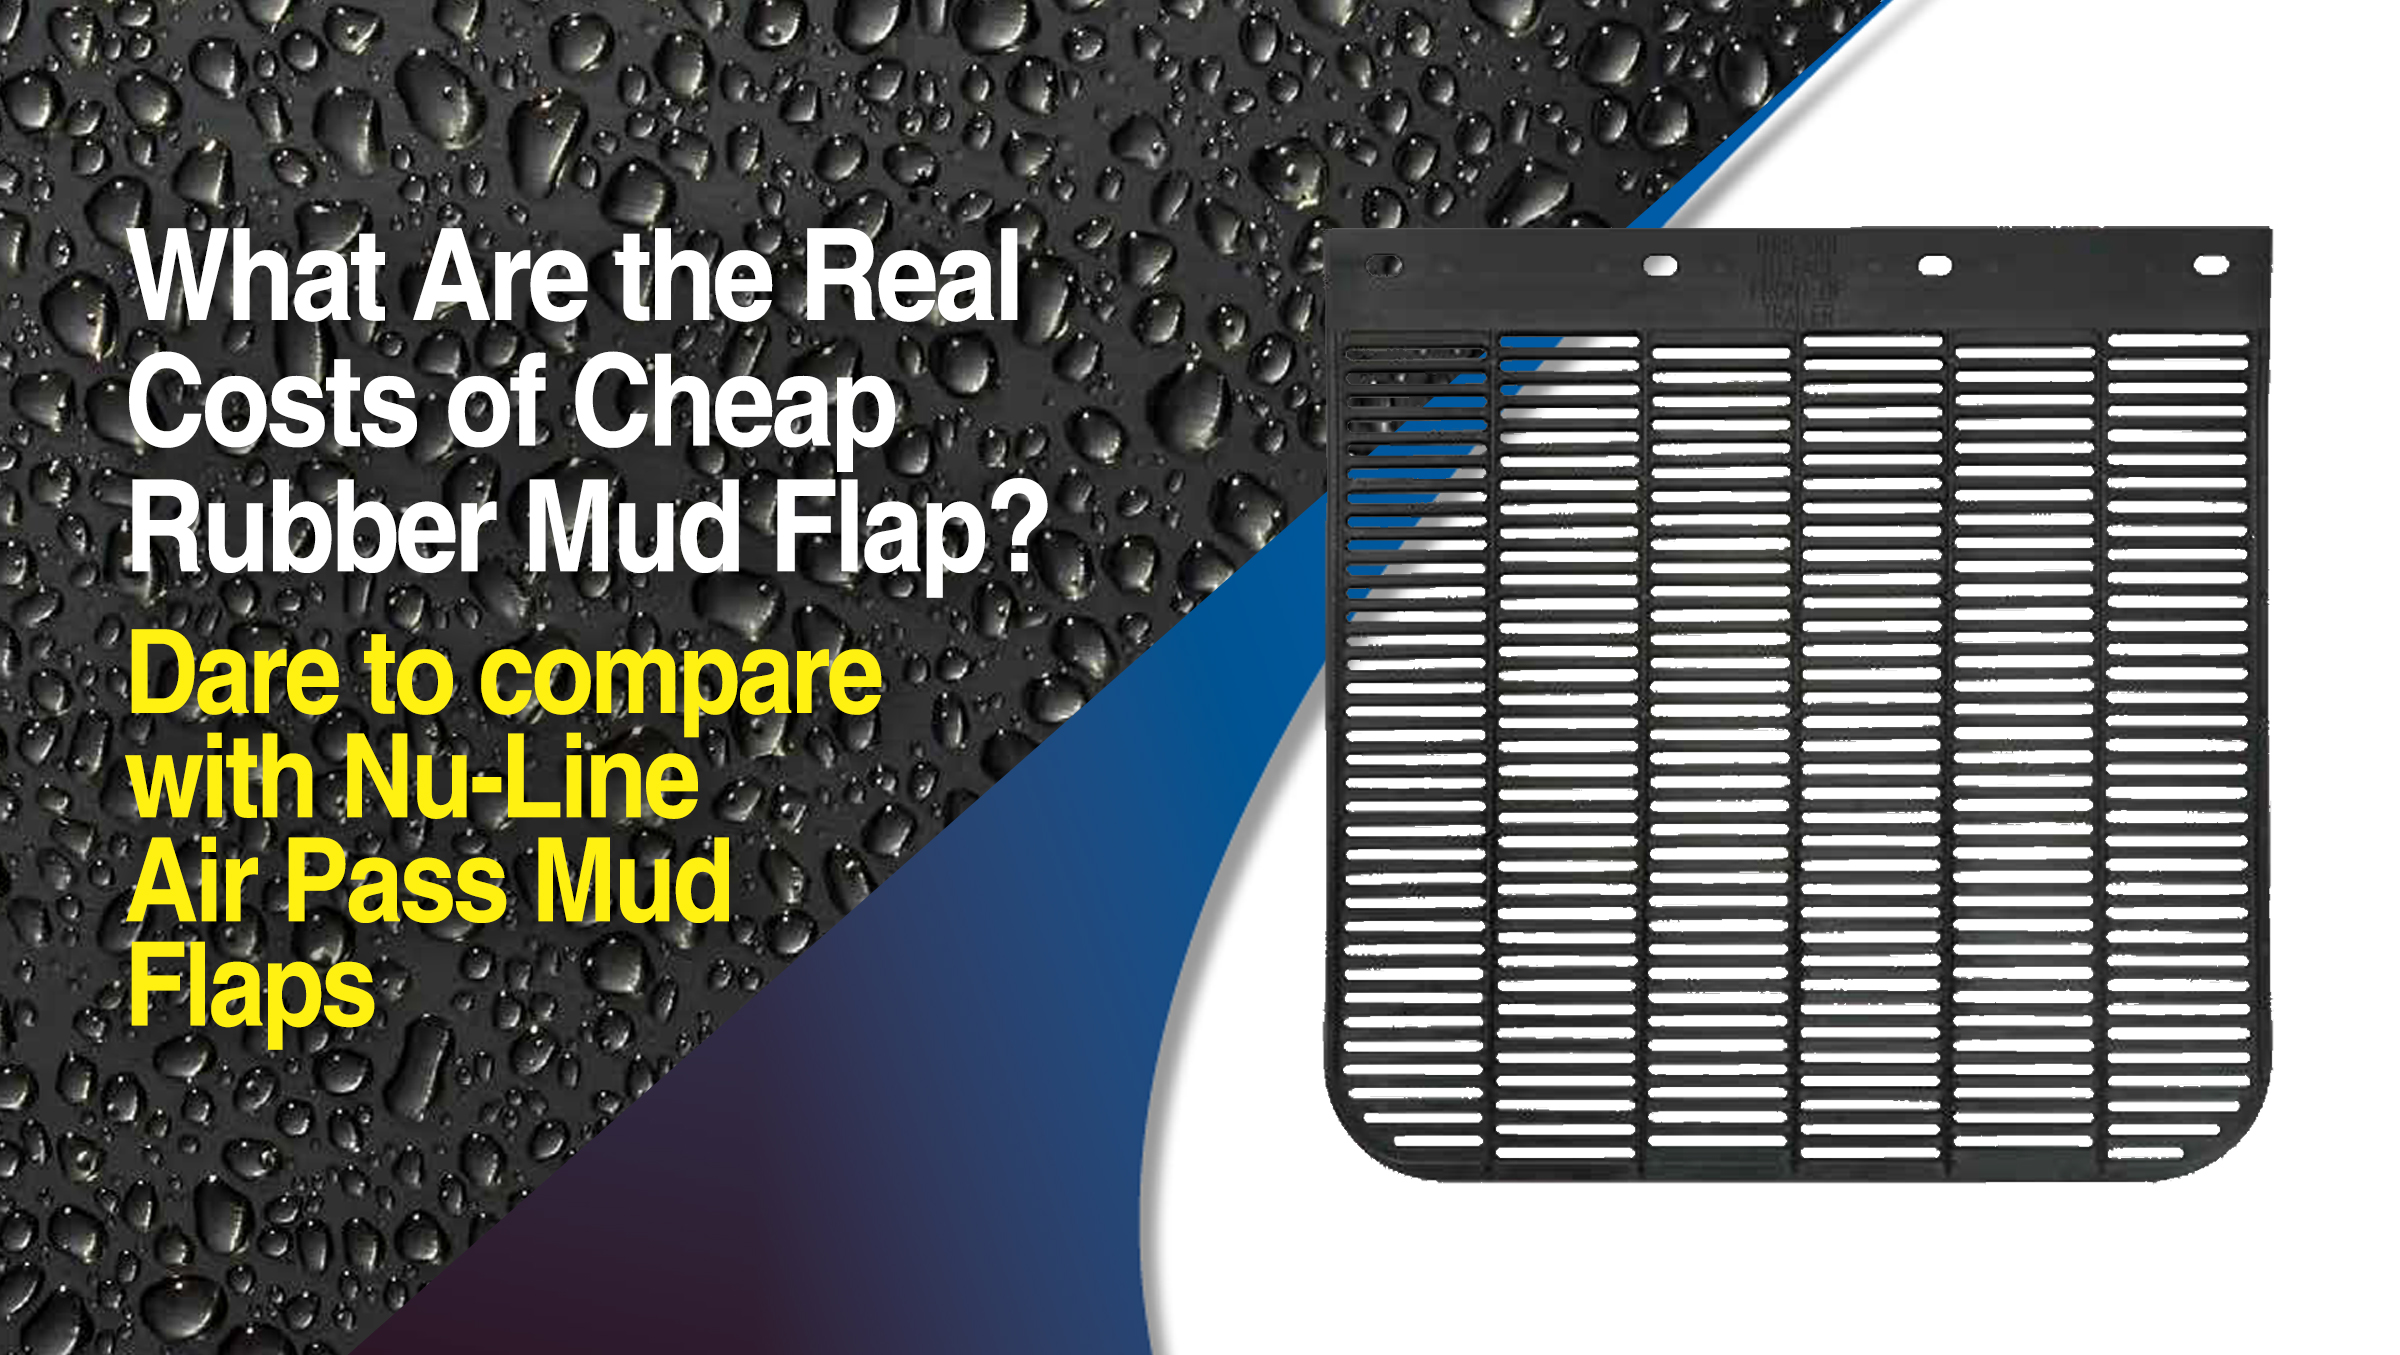 Air Pass Mud Flaps